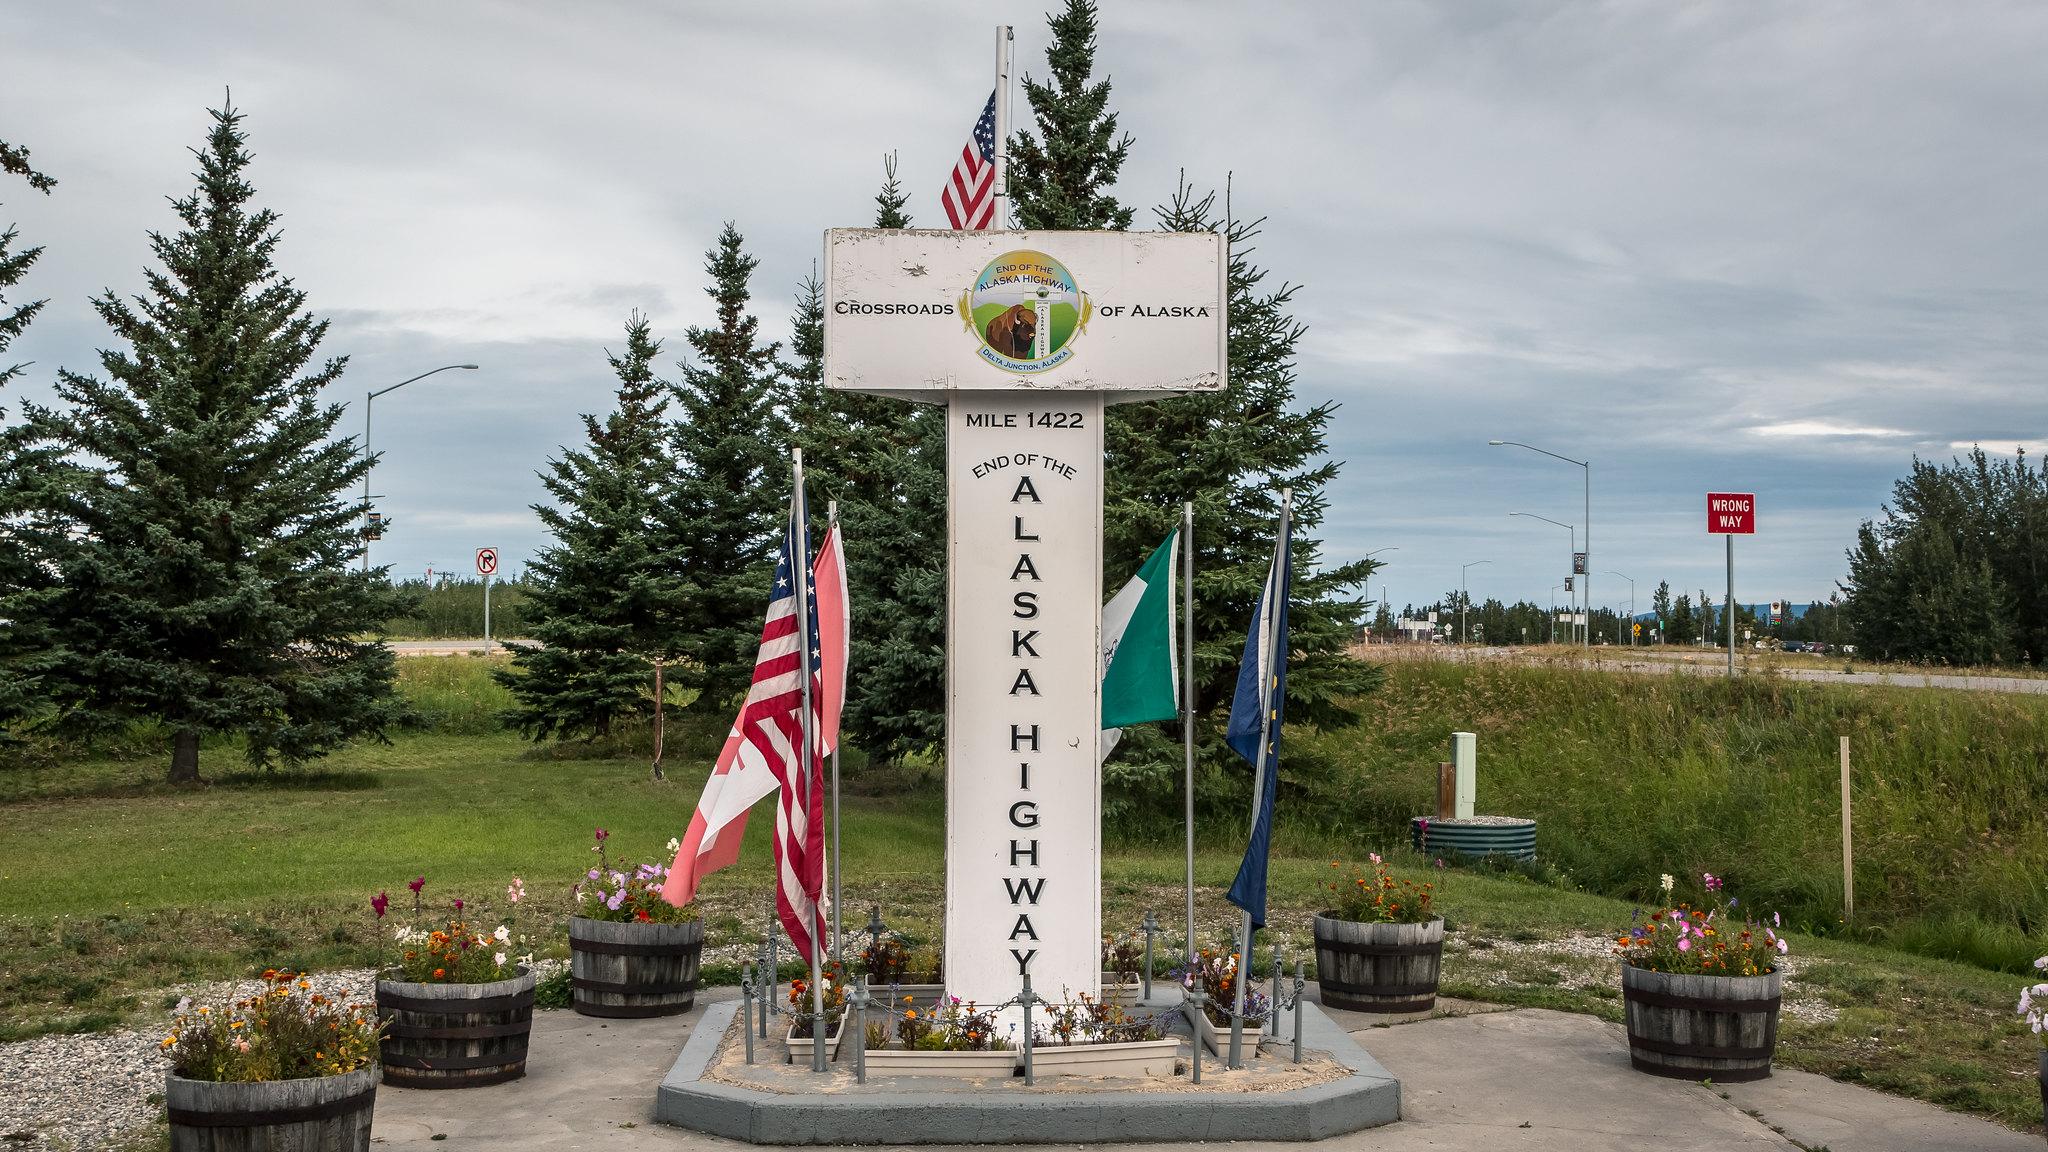 Alaska Highway - Alaska - [USA]